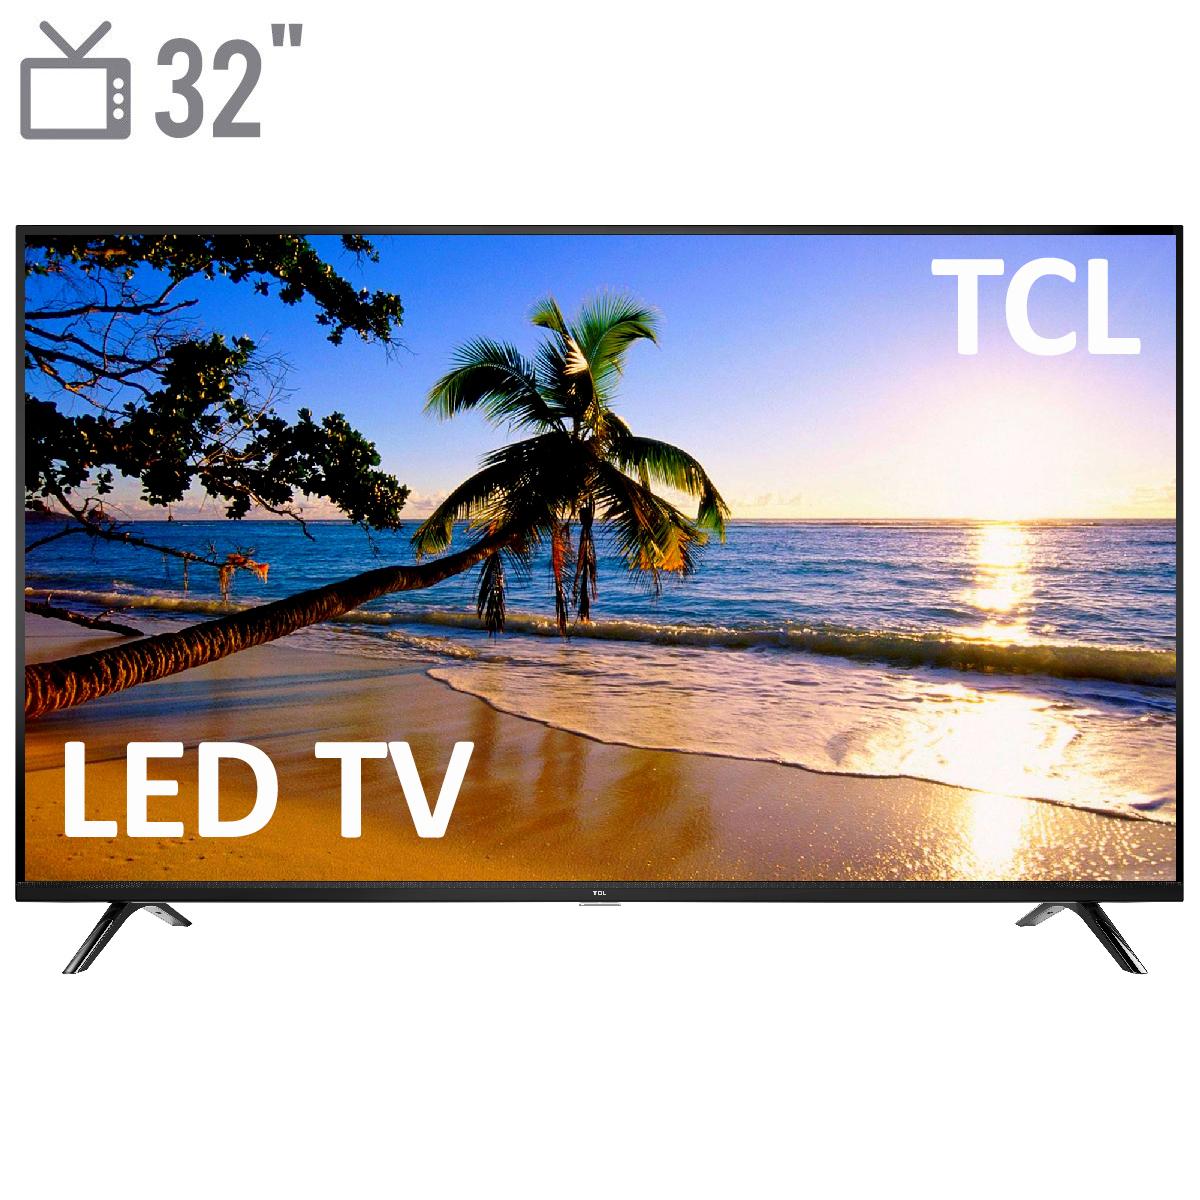 فروش نقدی و اقساطی تلویزیون ال ای دی ۳۲ اینچ TCL مدل ۳۲D3000i